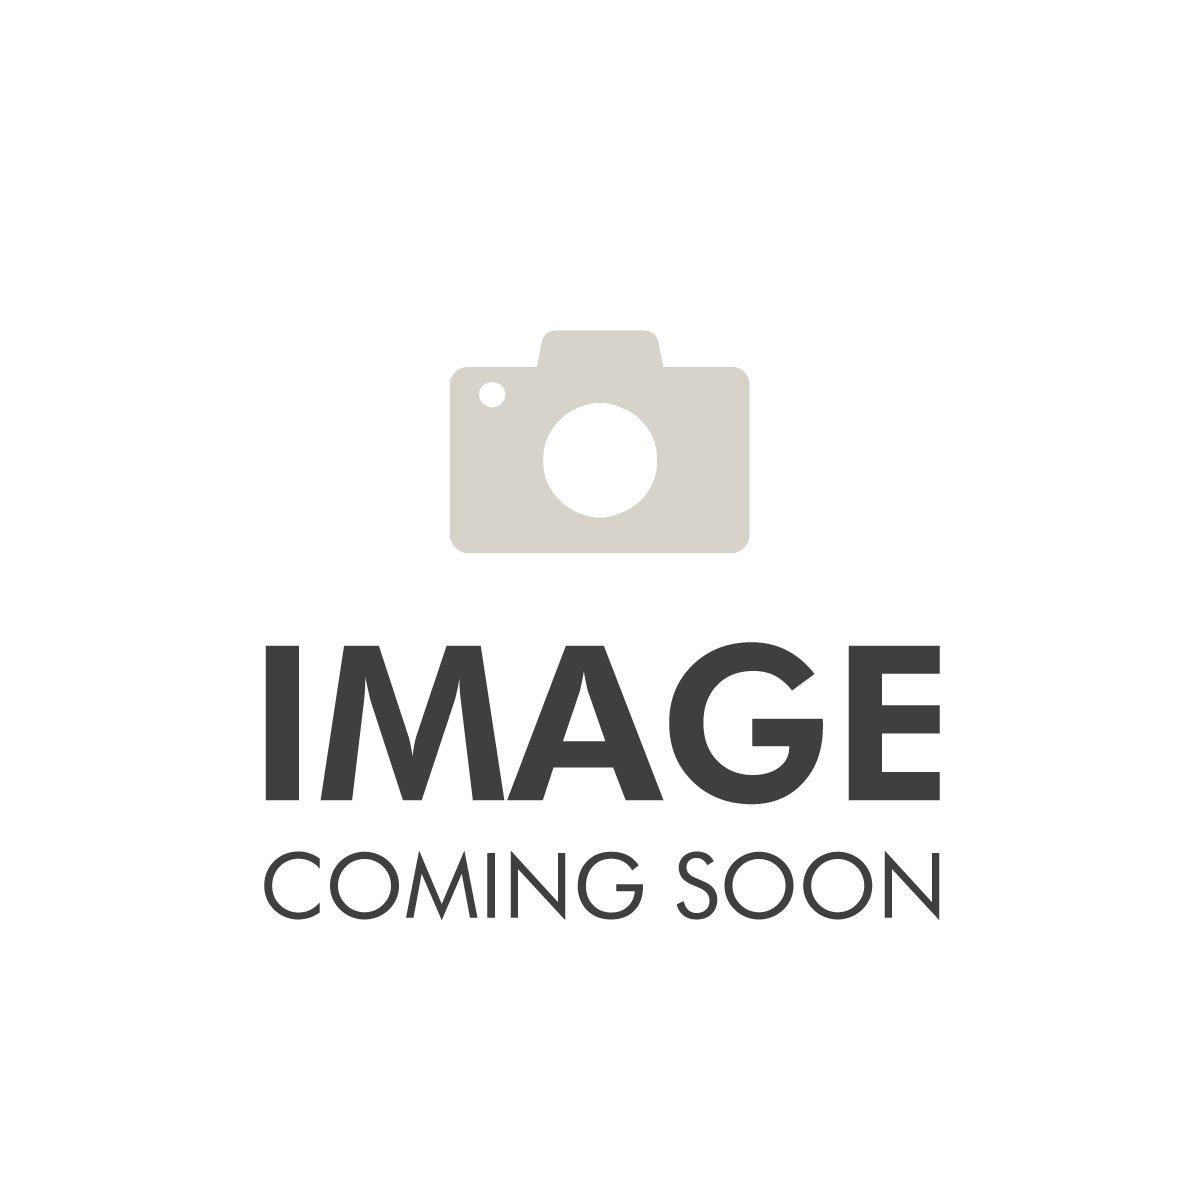 Calvin Klein Eternity Aqua 30ml EDT Spray